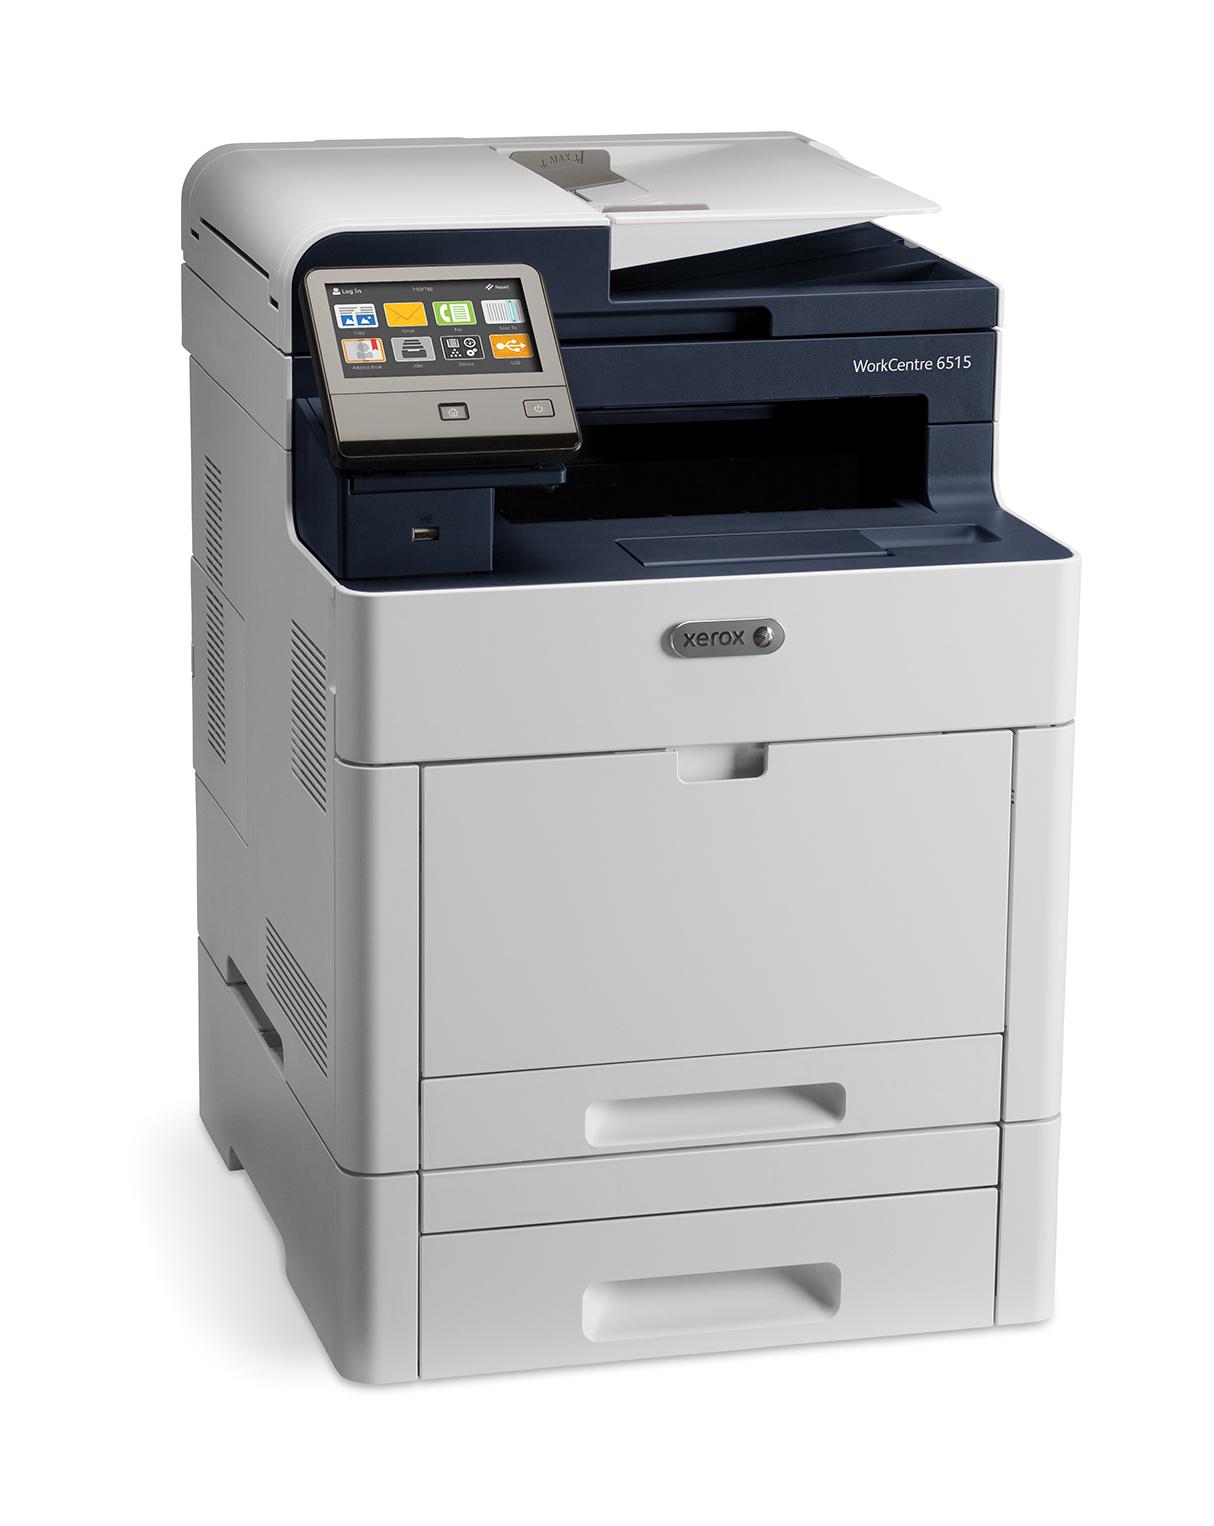 twist Printer